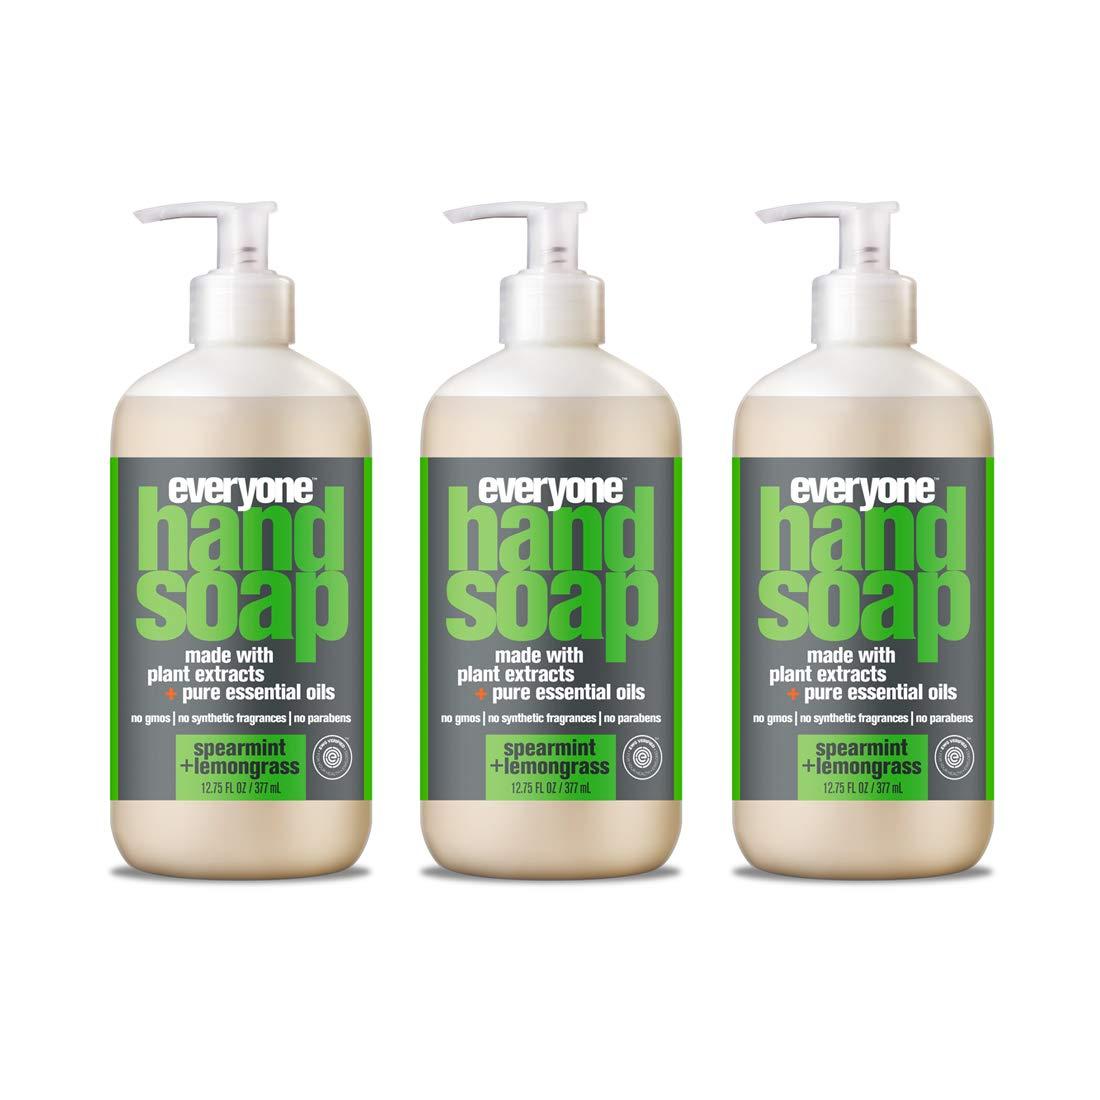 Everyone Hand Soap, Spearmint and Lemongrass, 12.75 Fl Oz (Pack of 3)